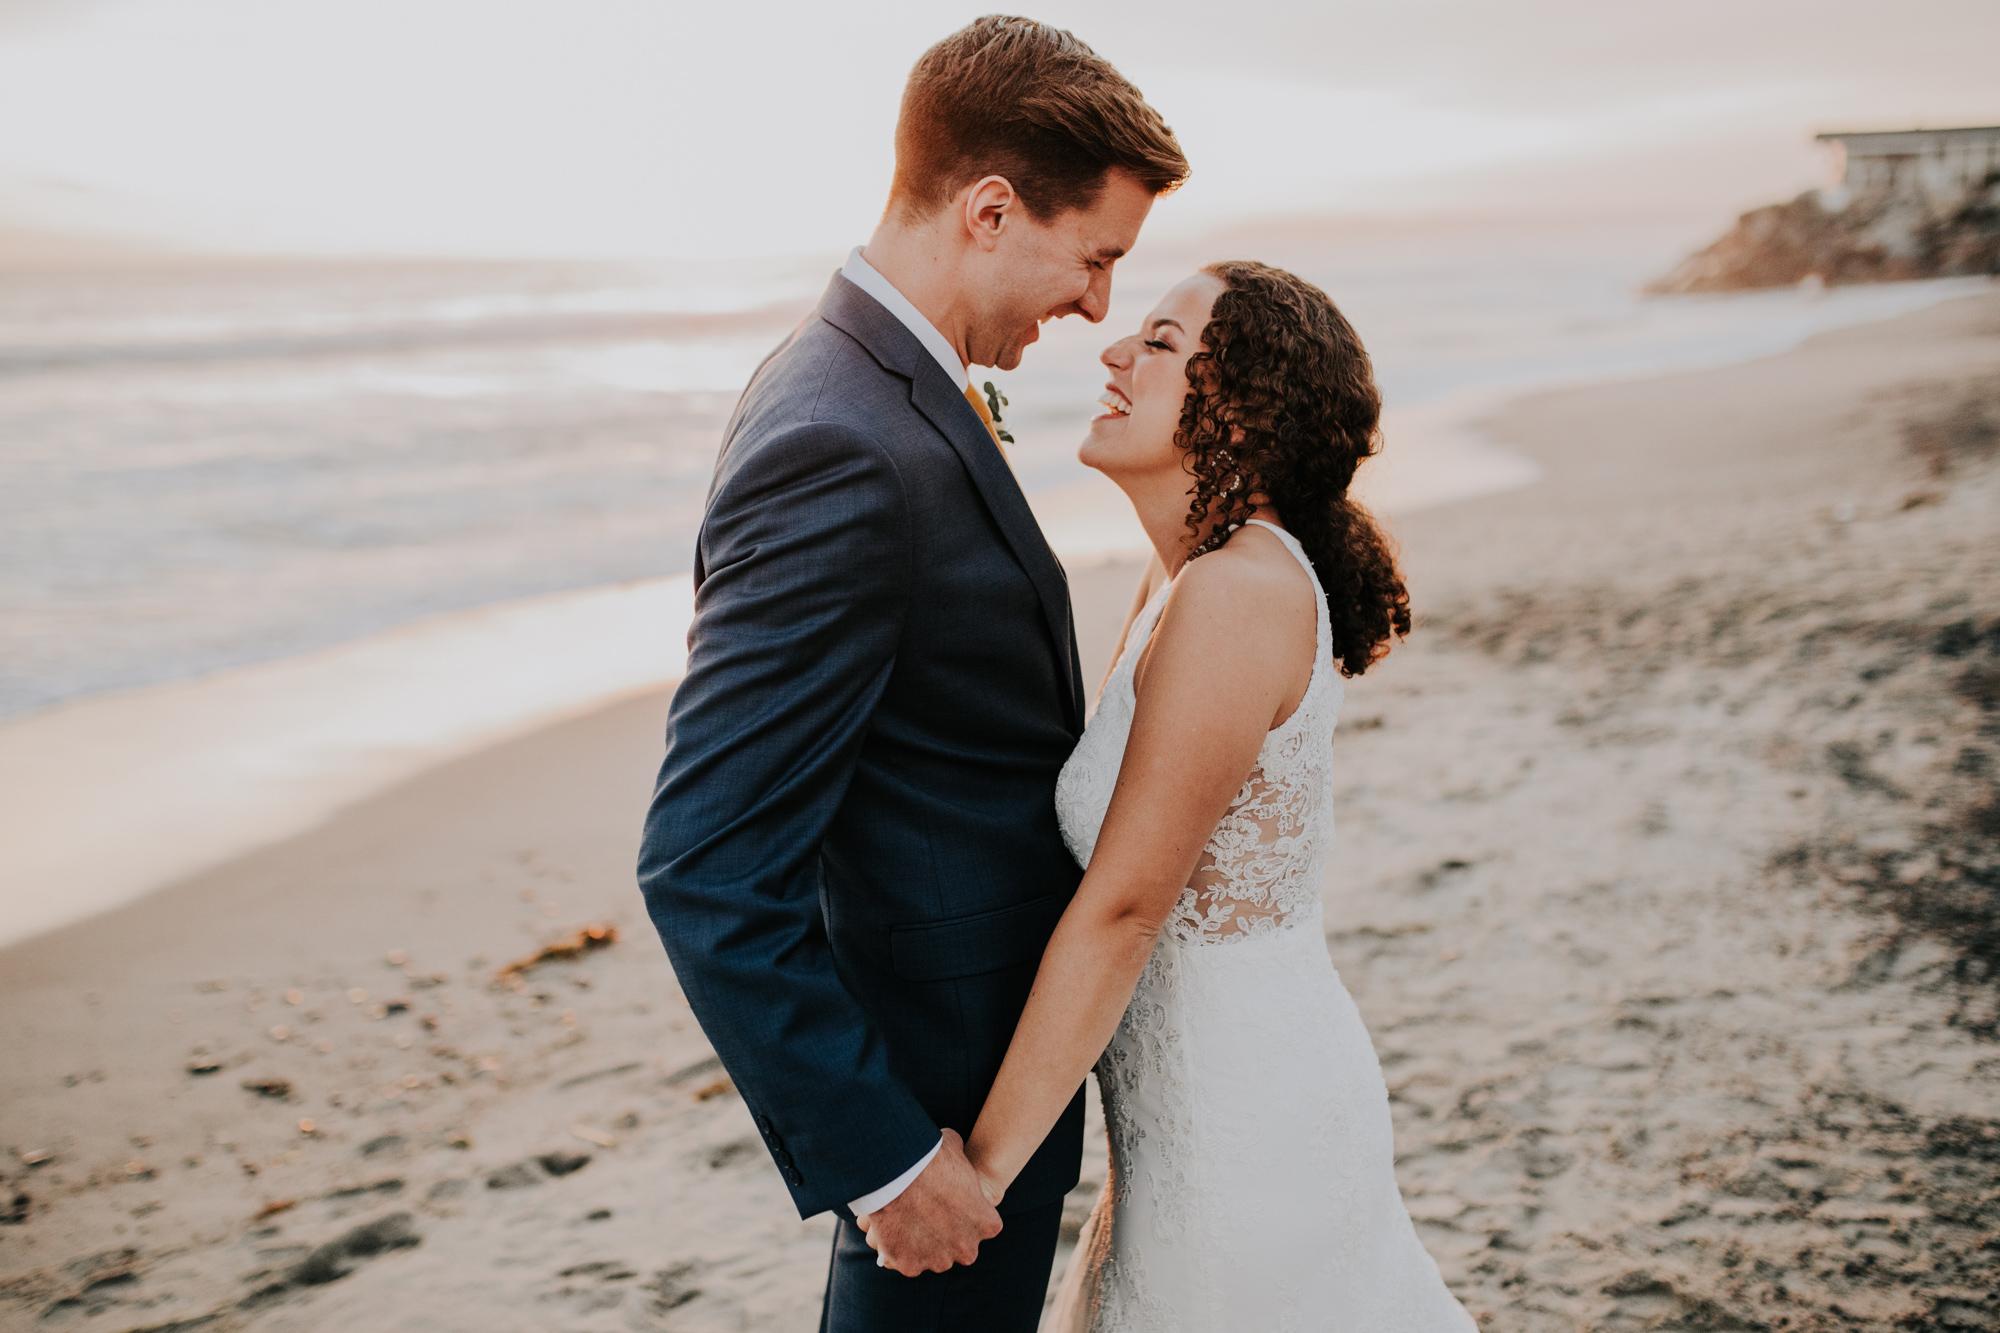 140-destination-wedding-san-clemente-california.jpg